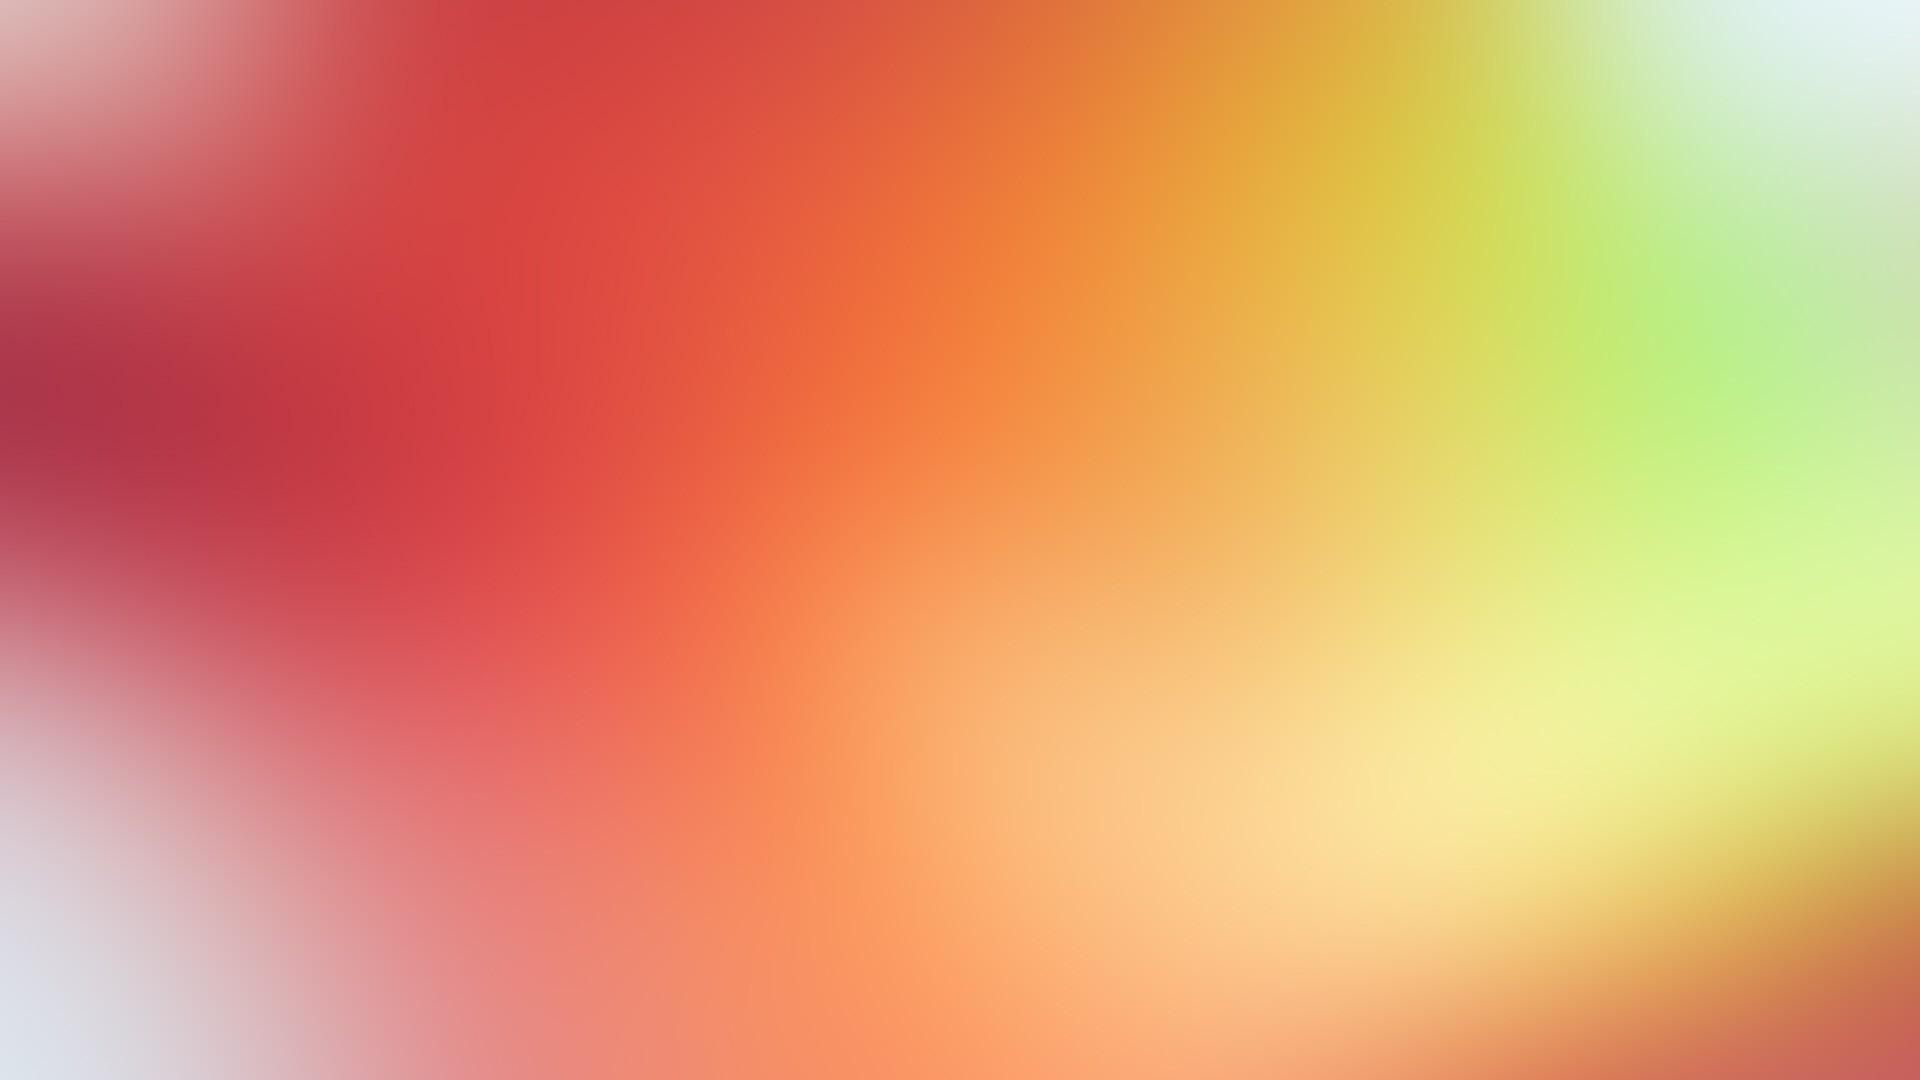 full hd 1080p yellow wallpapers hd, desktop backgrounds 1920×1080